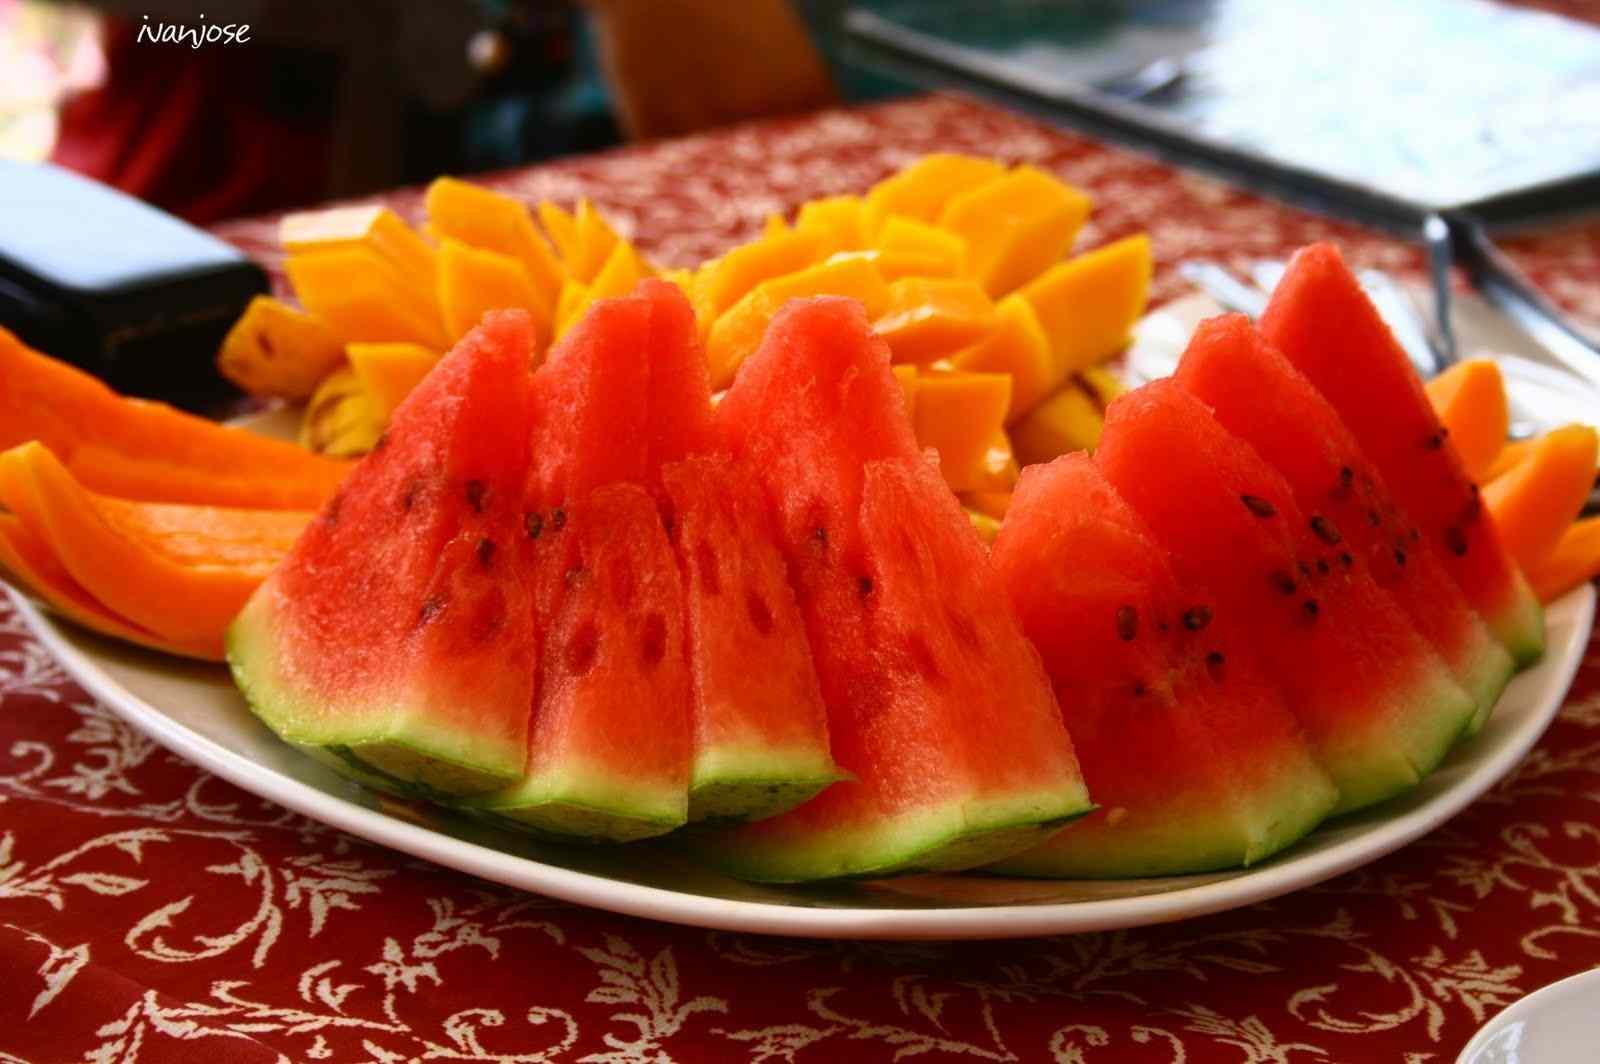 Fresh mango, melon, and watermelon slices at Sarangani Highlands in Mindanao